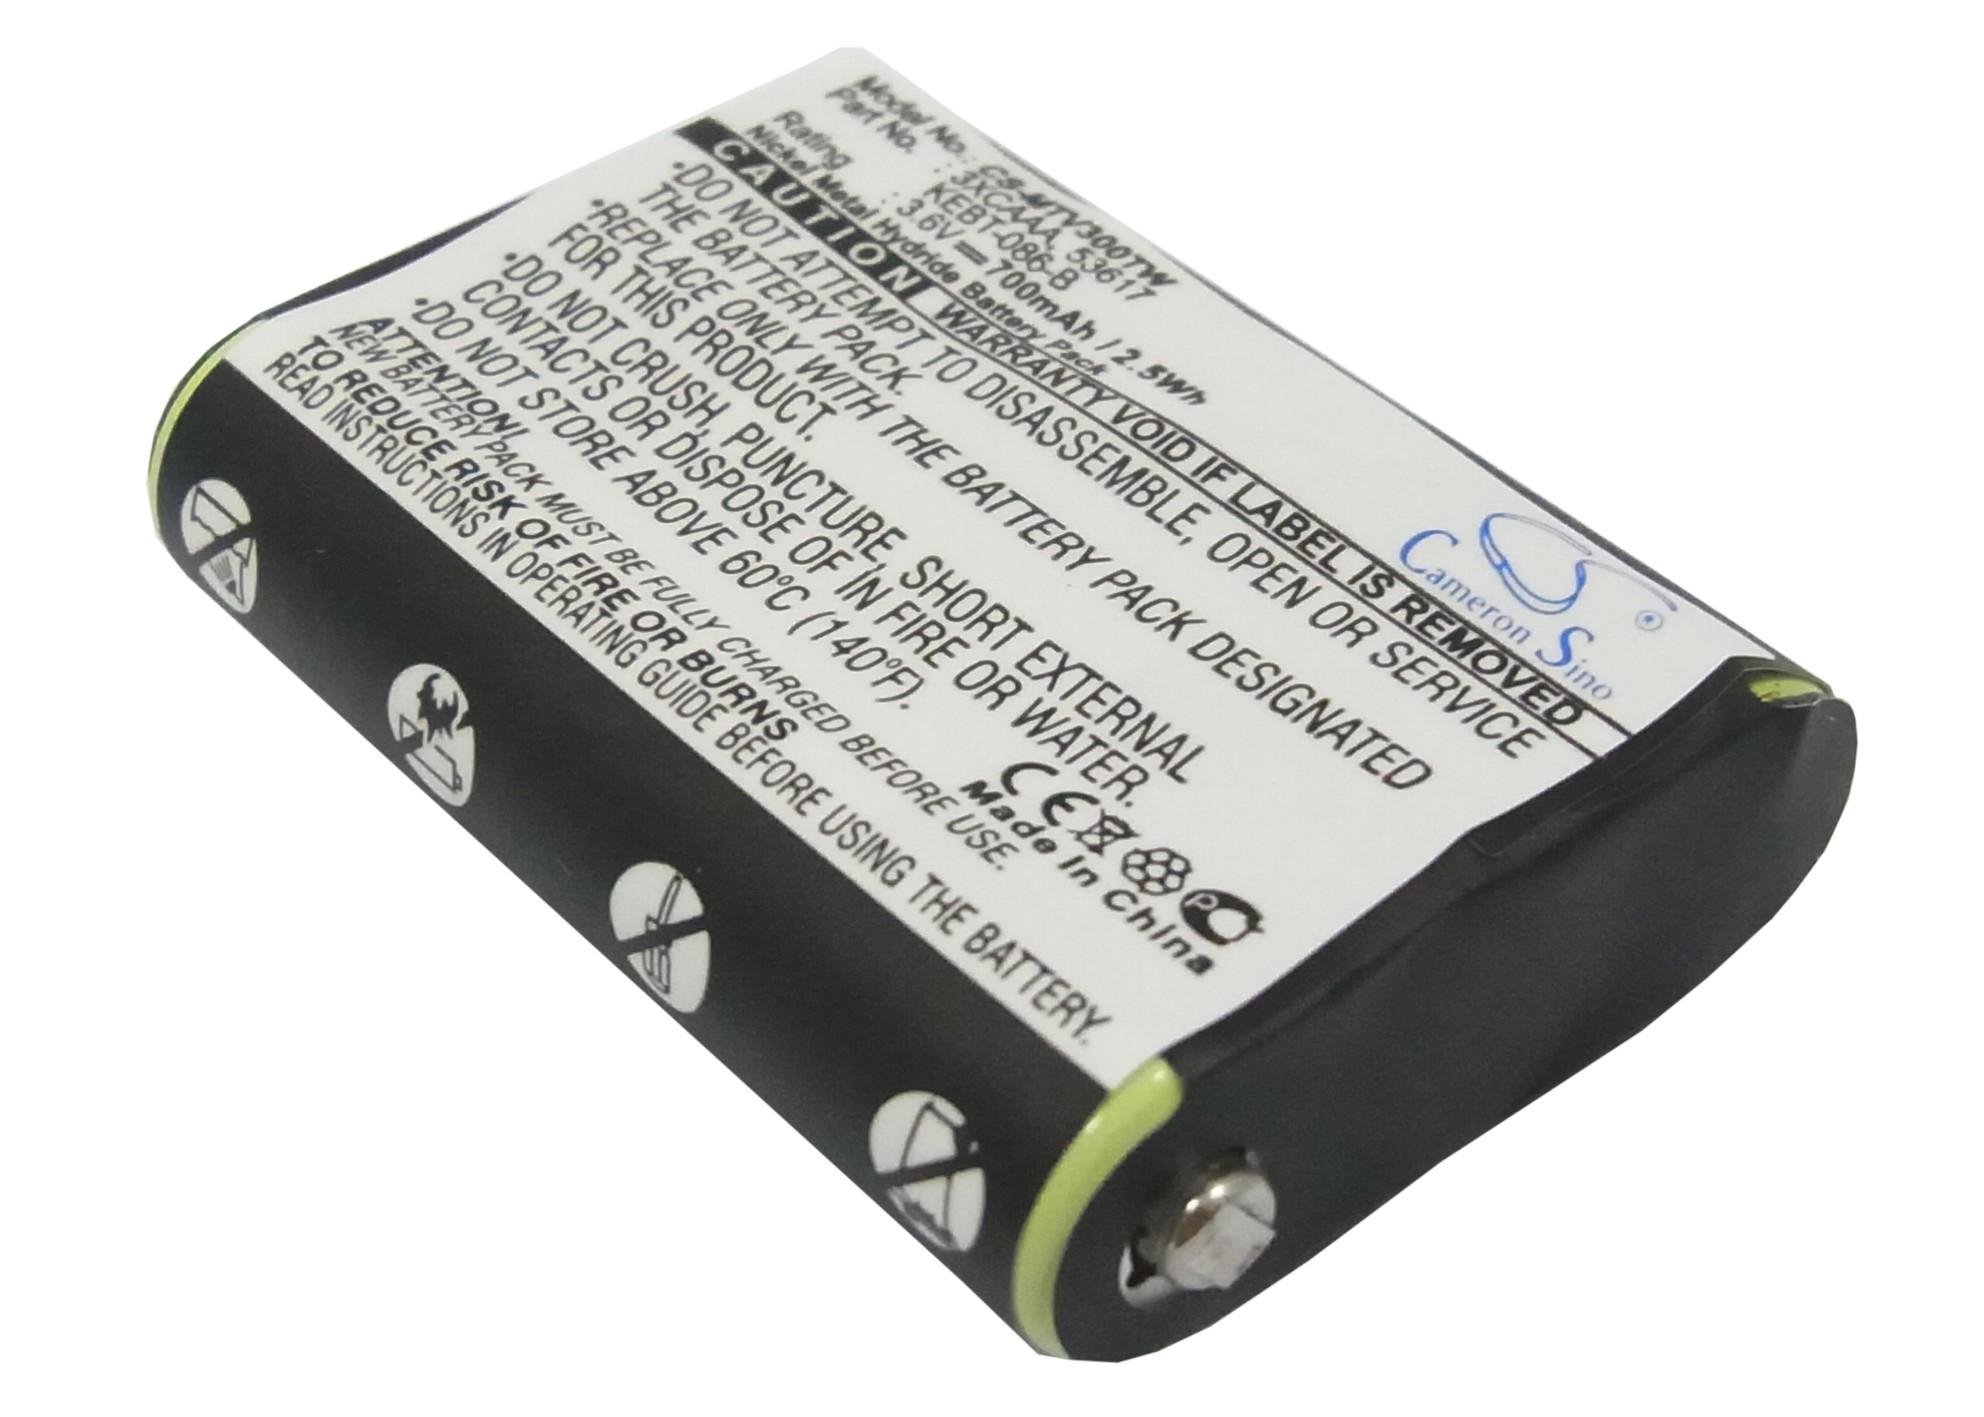 Cameron Sino baterie do vysílaček pro MOTOROLA SX900R 3.6V Ni-MH 700mAh černá - neoriginální